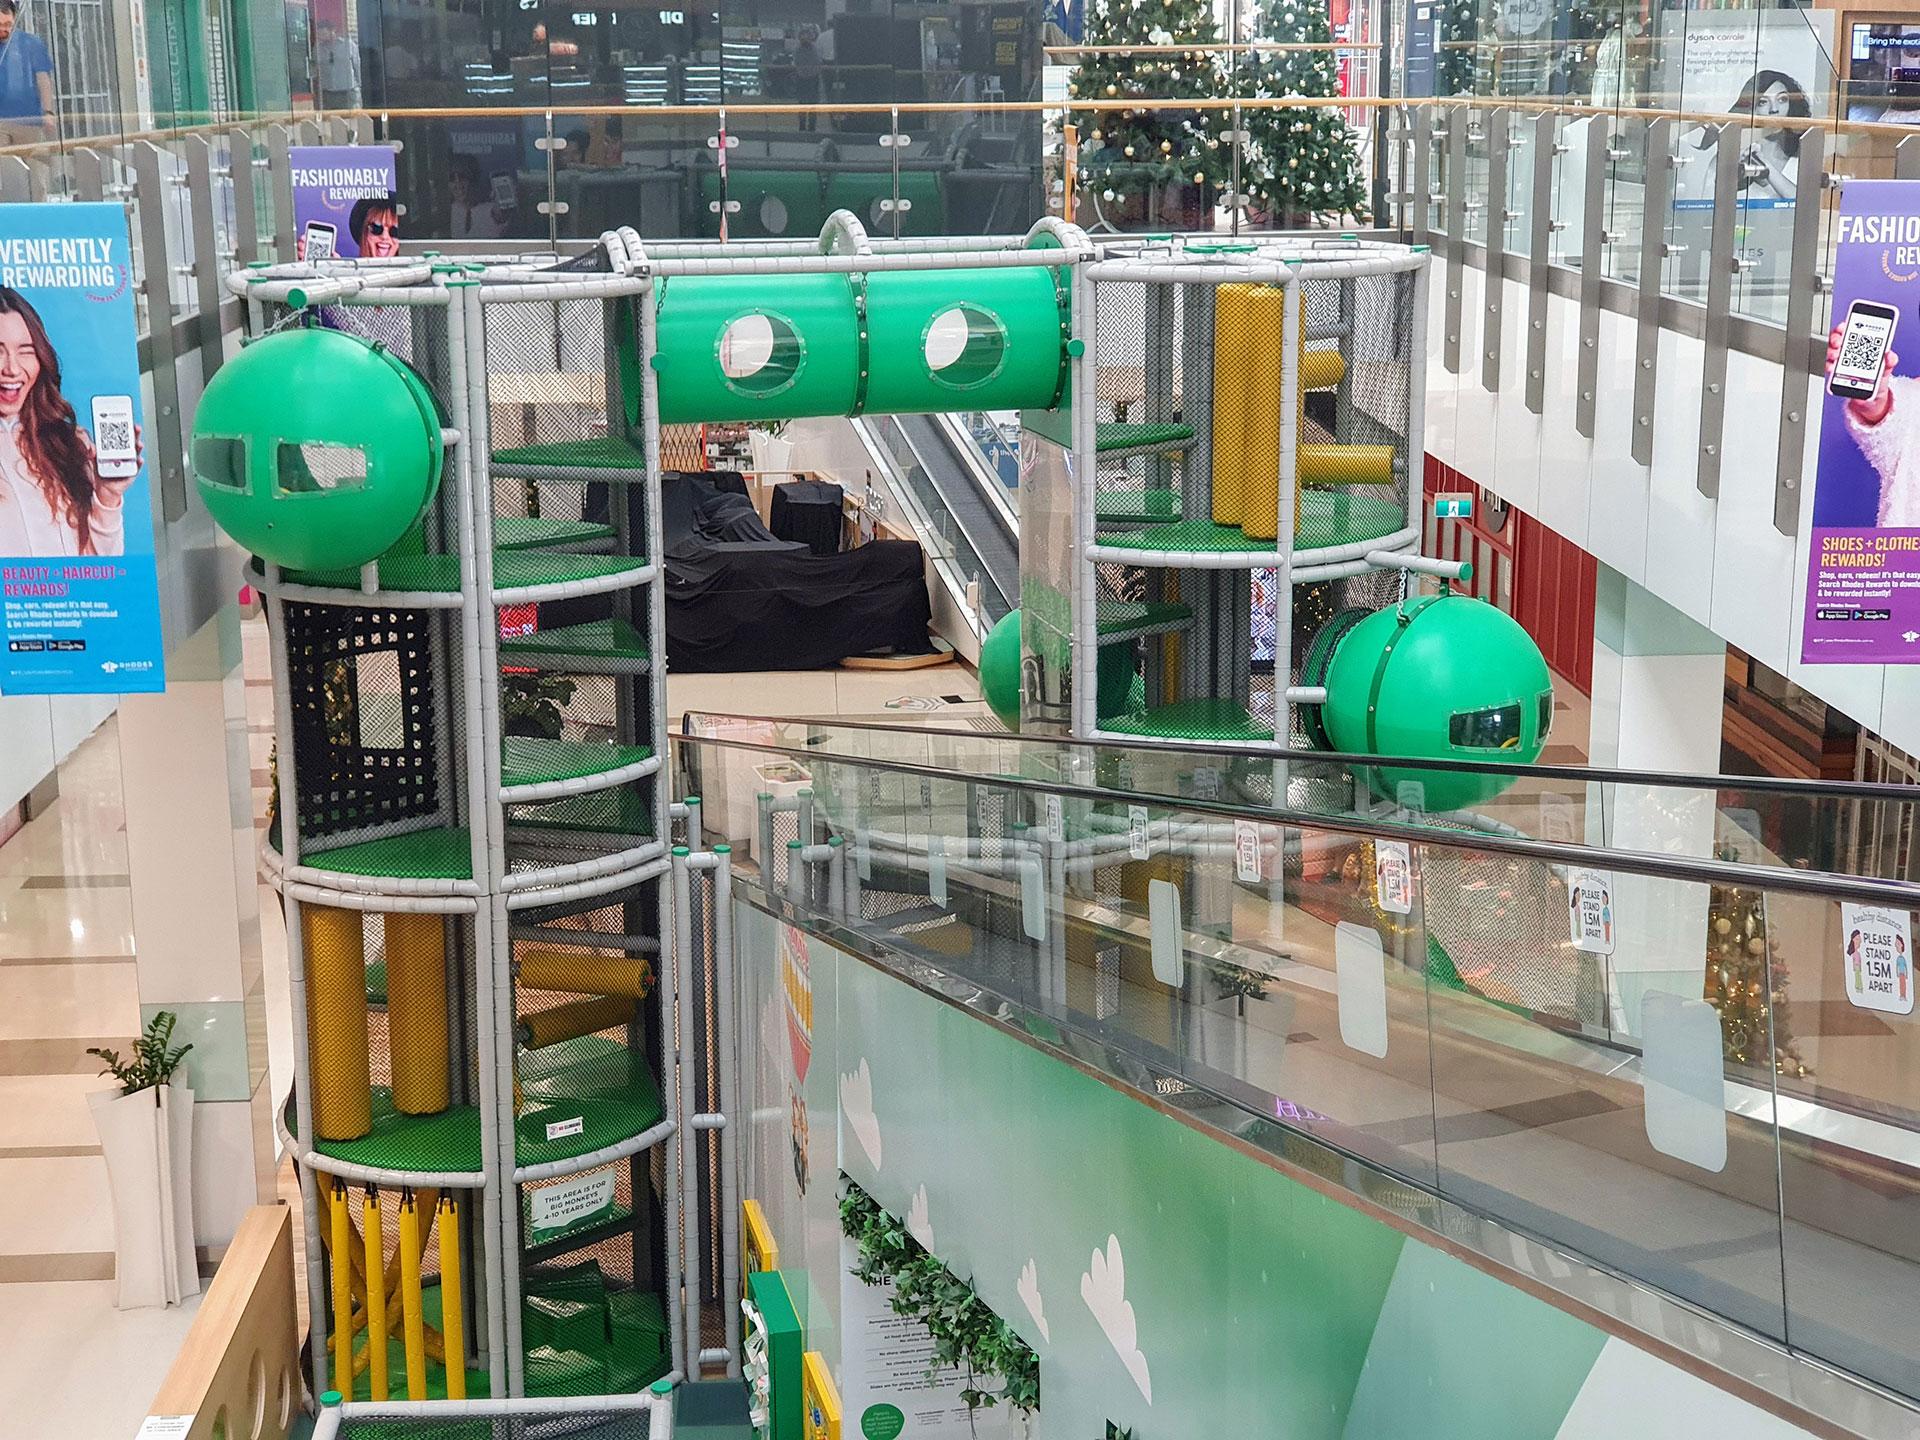 Playtec indoor playgrounds.